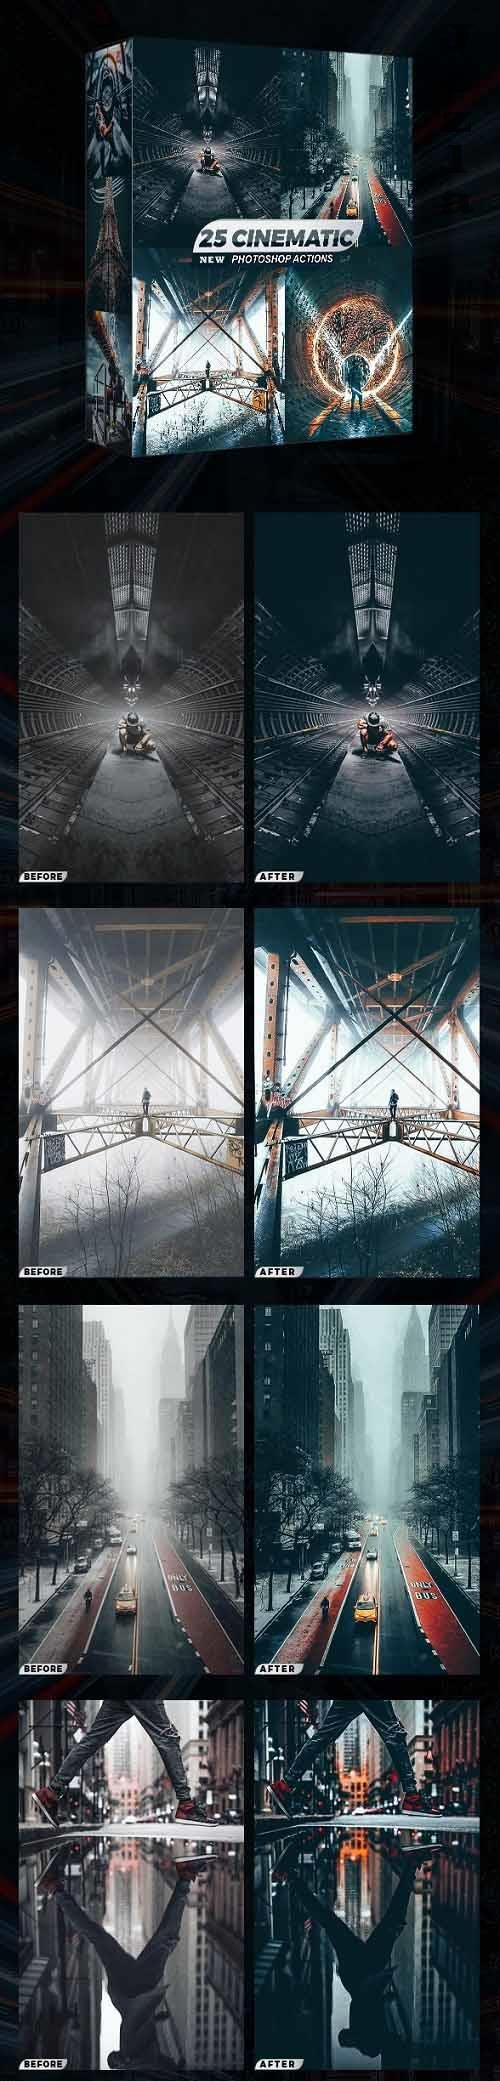 GraphicRiver - 25 Cinematic Photoshop Actions 28884599